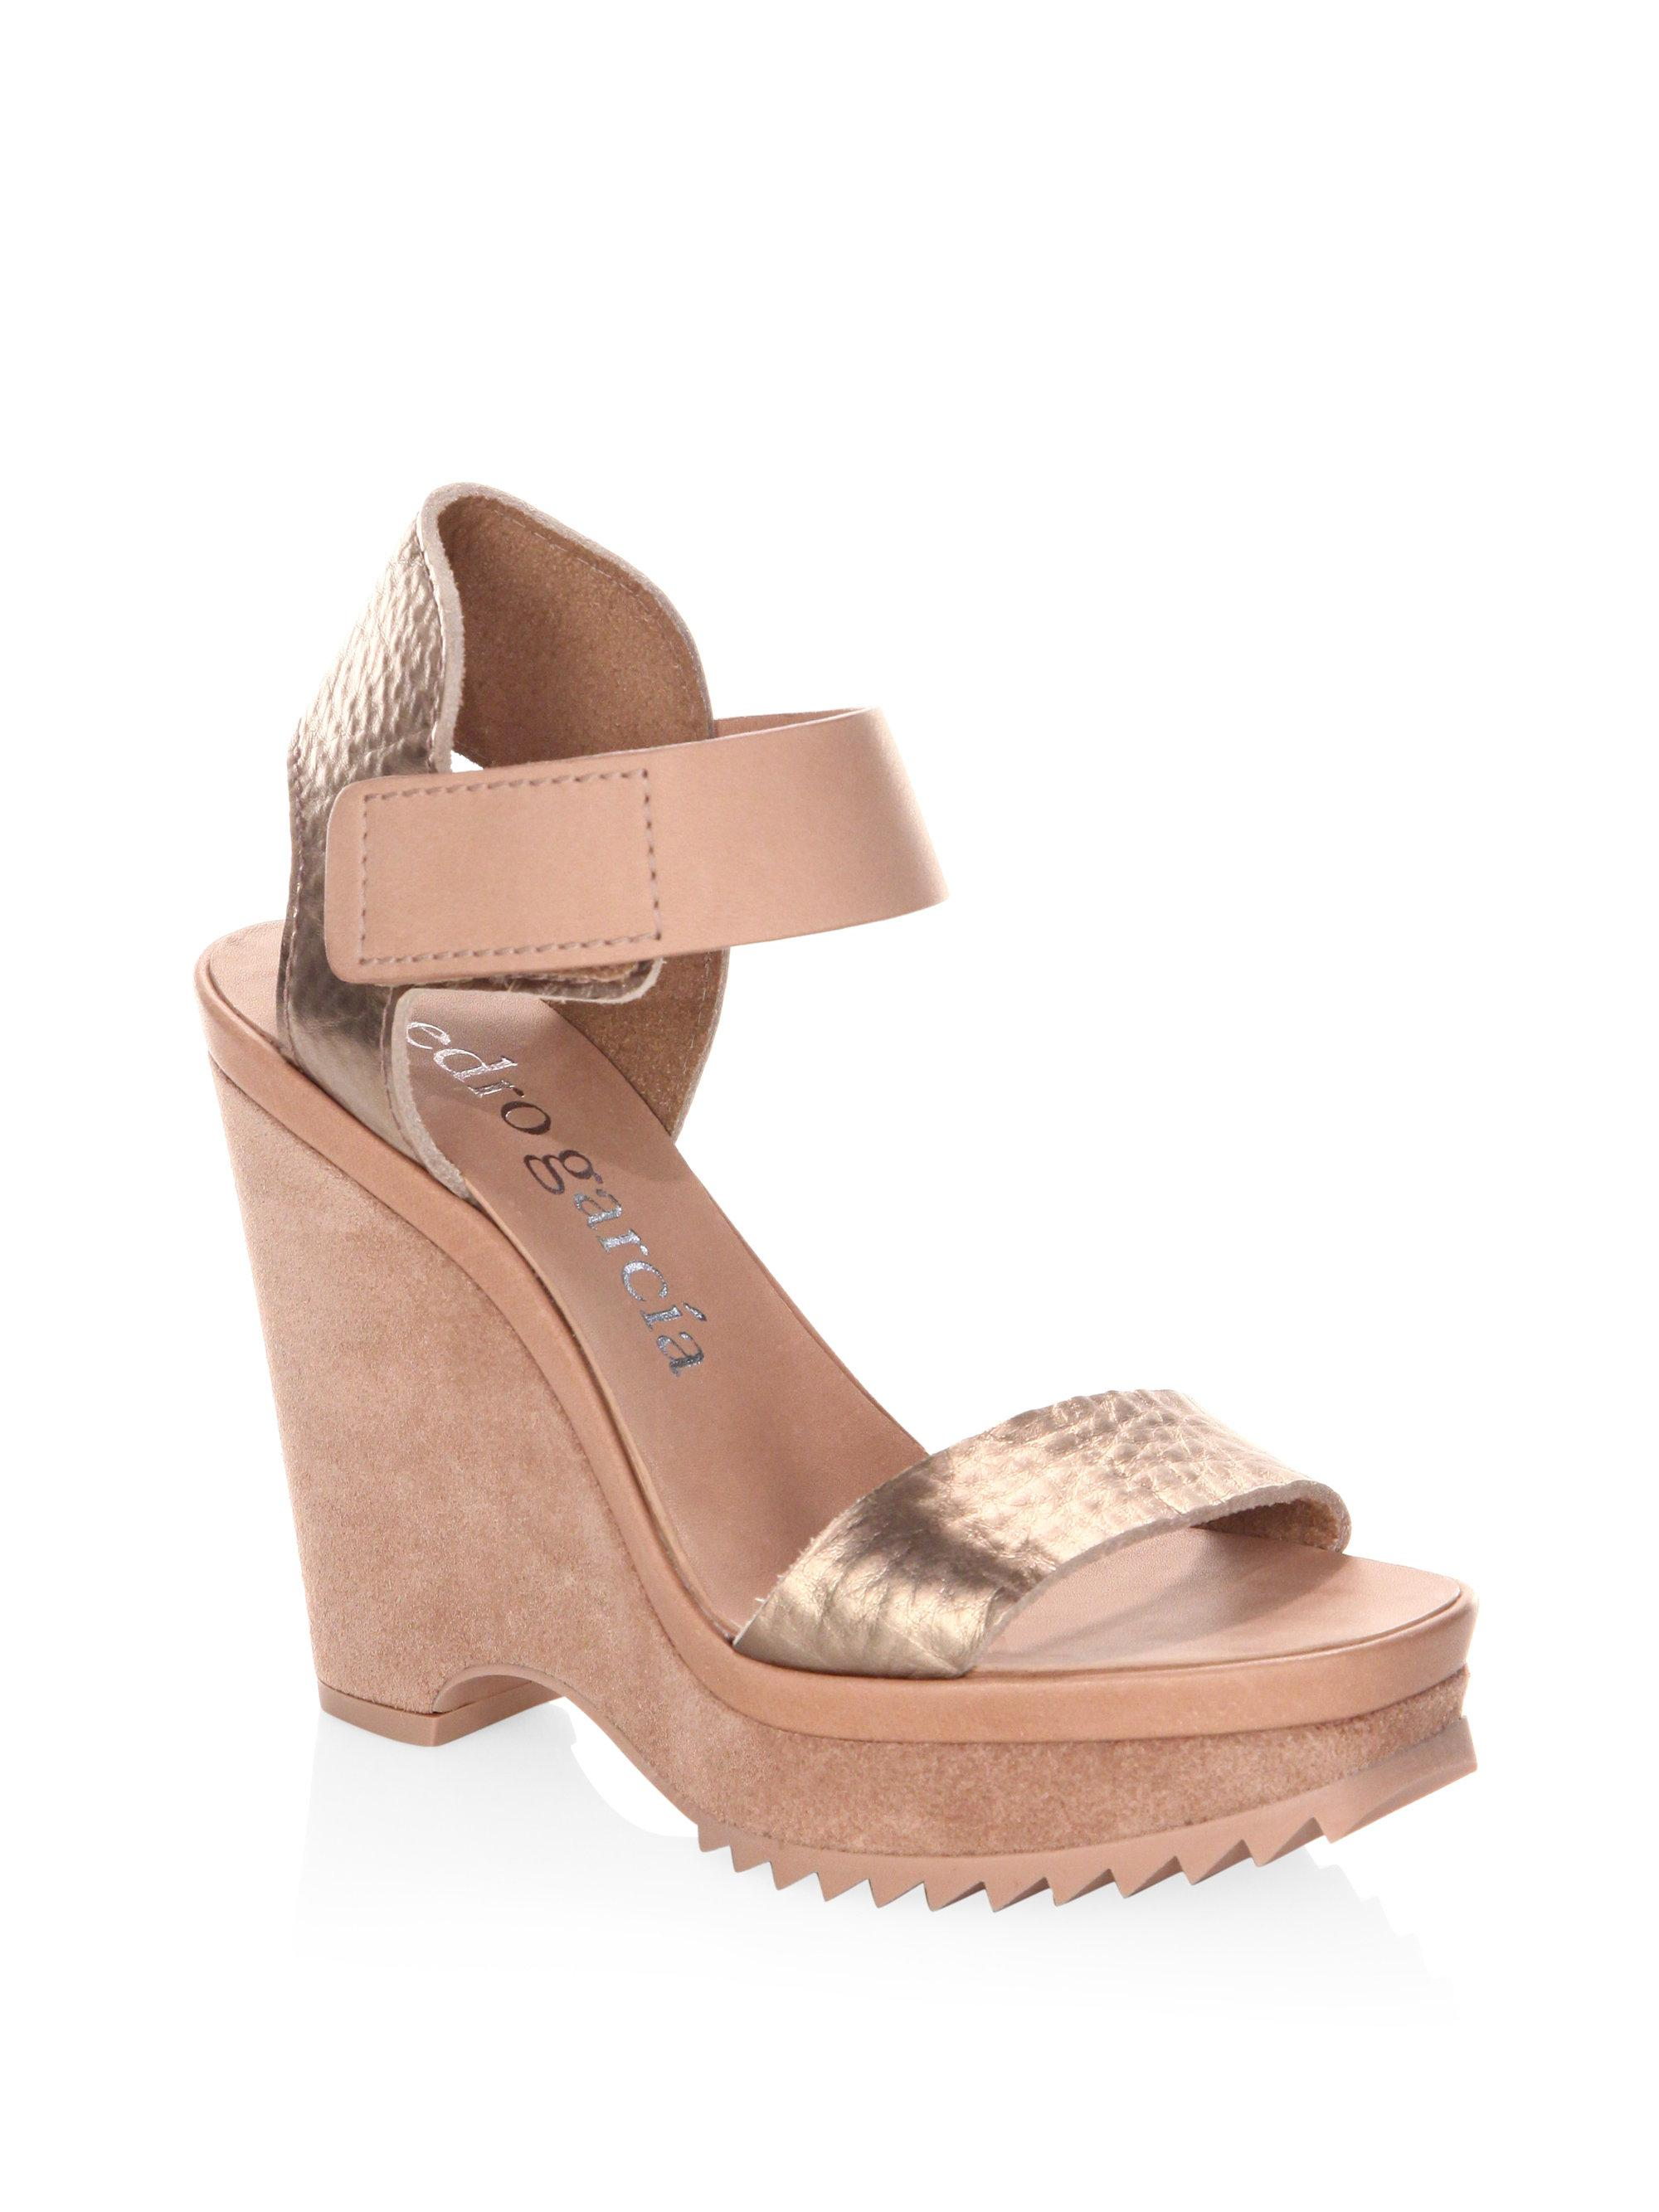 Pedro Garcia Franses Leather Platform Wedge Sandals j4qiXhm